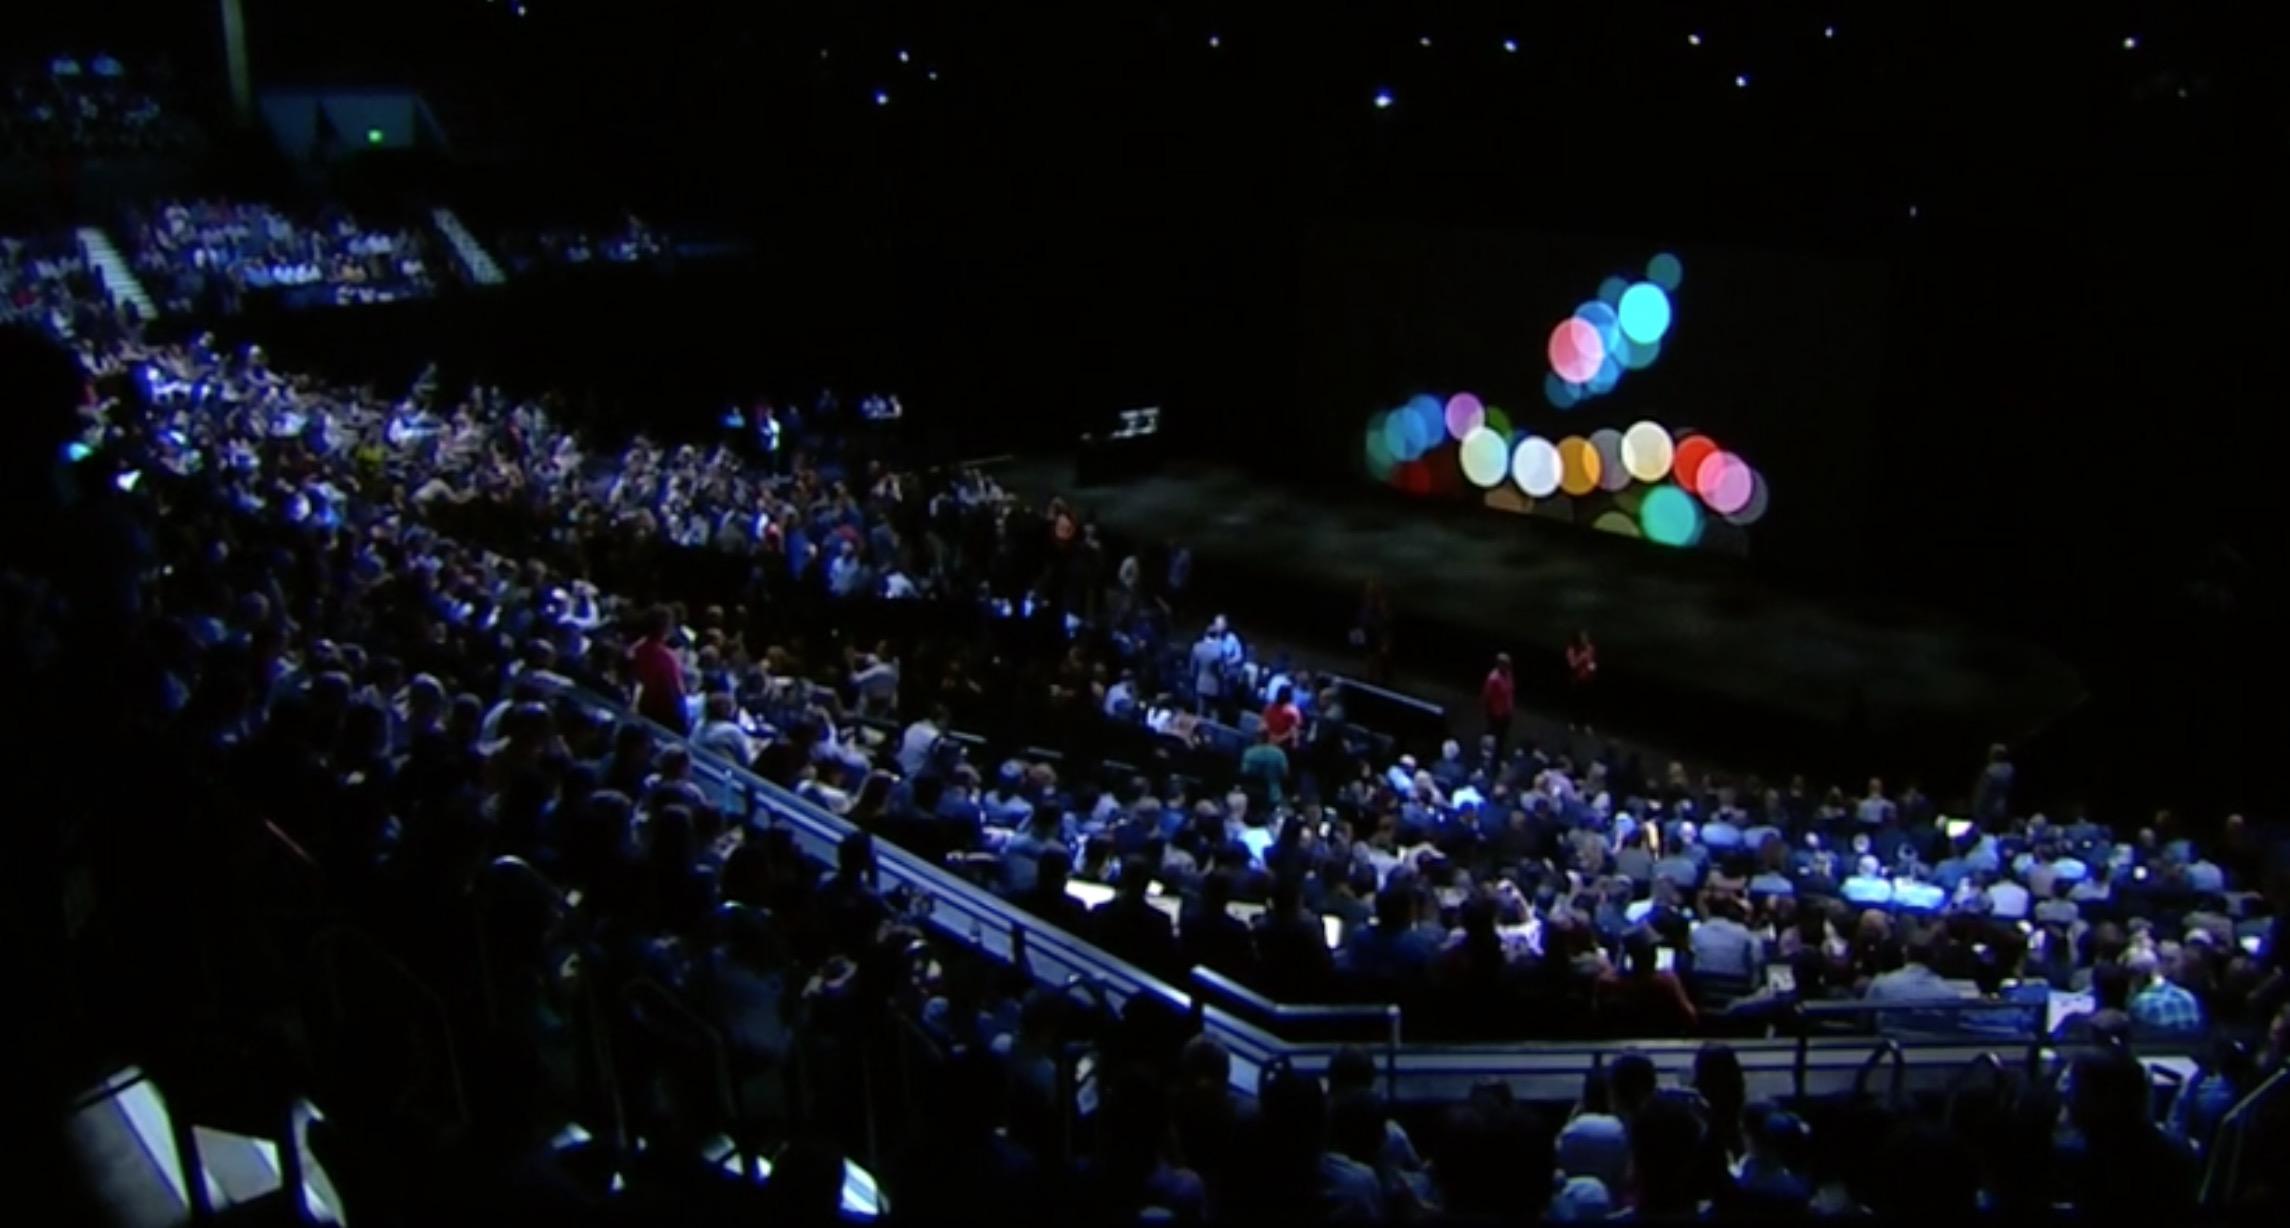 Evento Apple iPhone 7 e Apple Watch 2